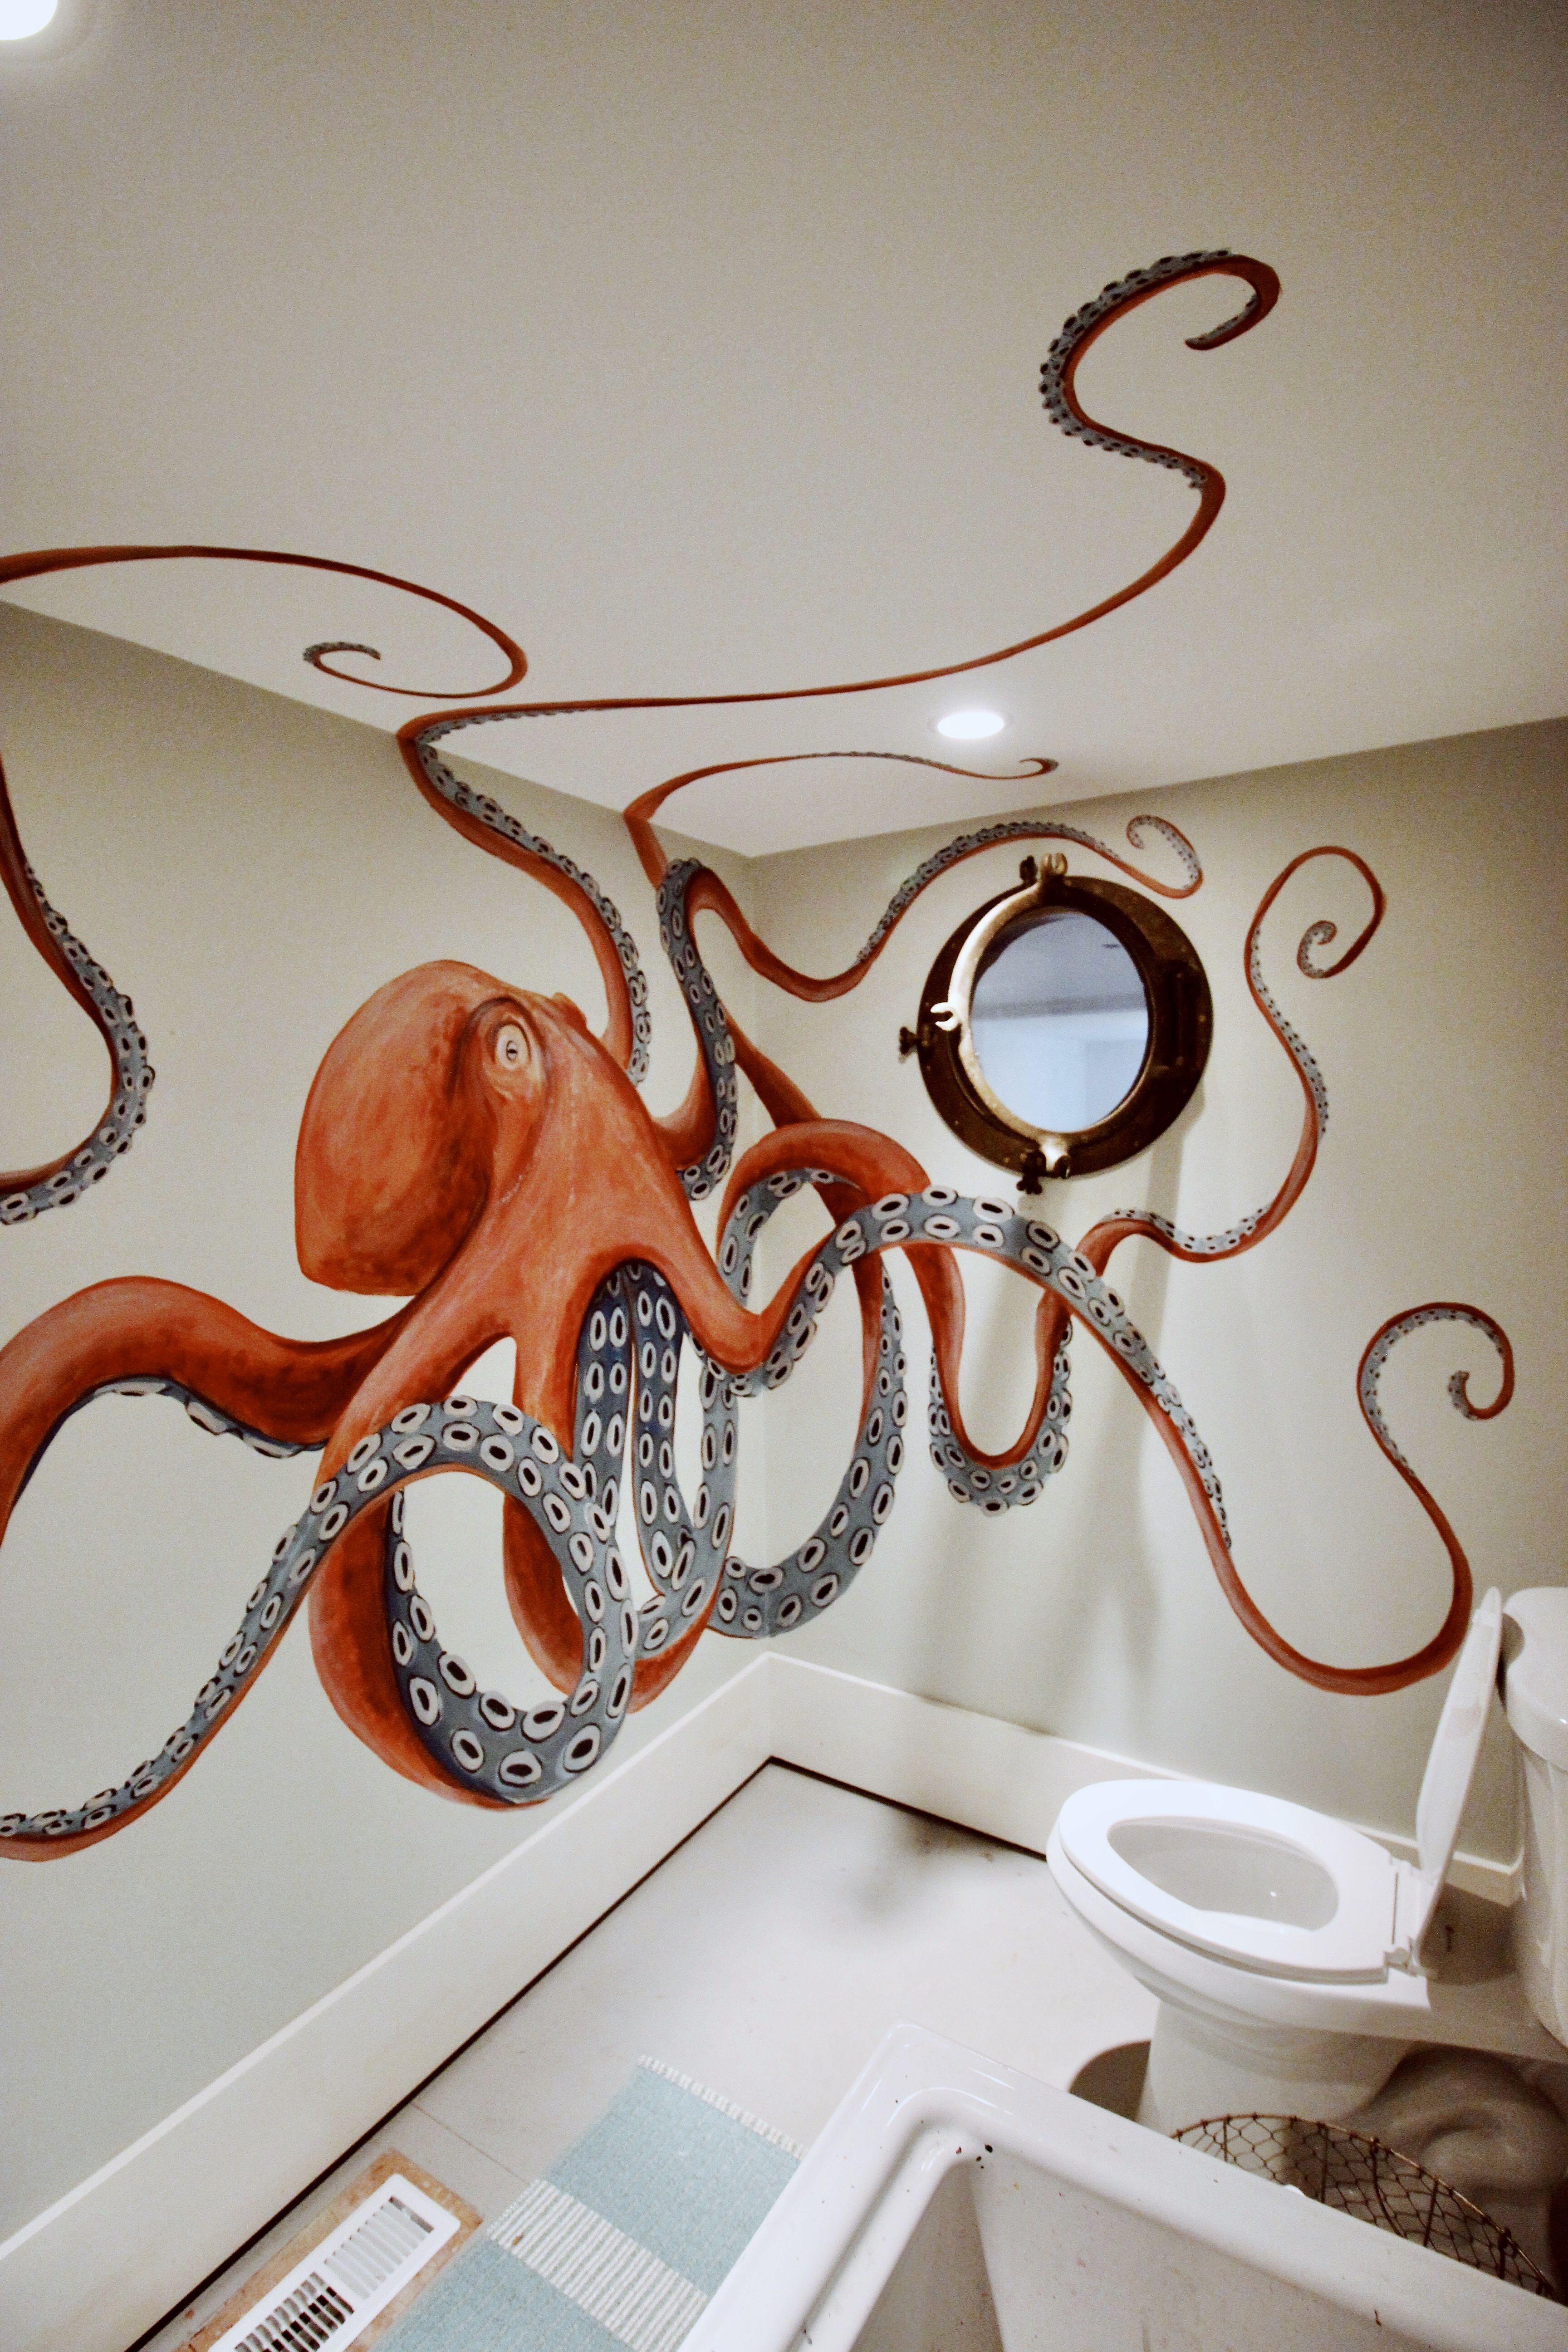 Octopus Bathroom Ideas Kitchen Livingroom Homedecorideas Interiordesign Bedroom Octopus Decor Octopus Bathroom Octopus Drawing